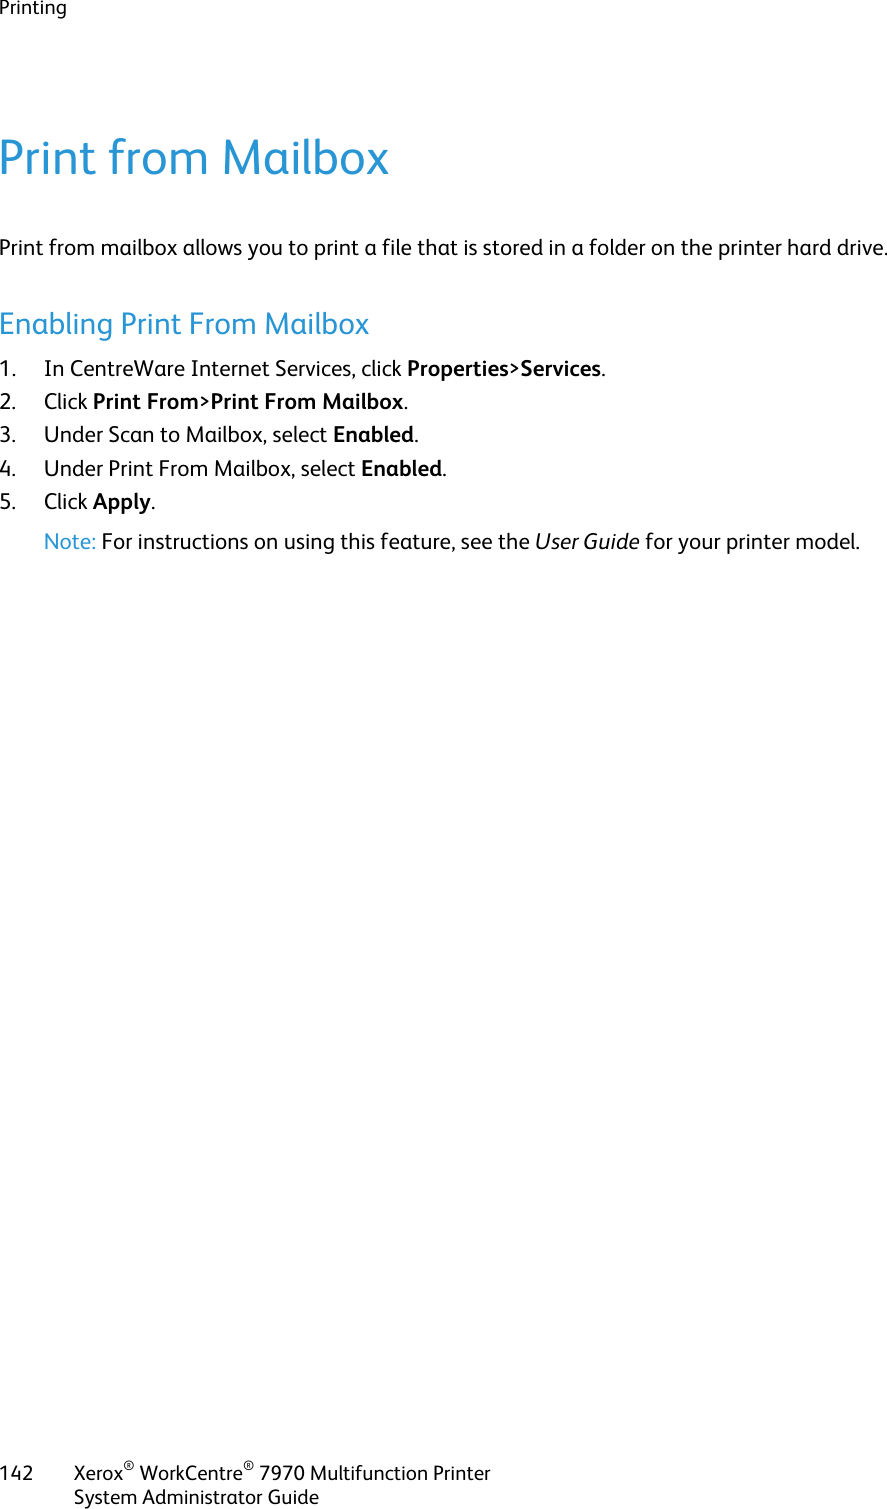 Xerox Workcentre 7970 Administrators Guide Xerox® WorkCentre